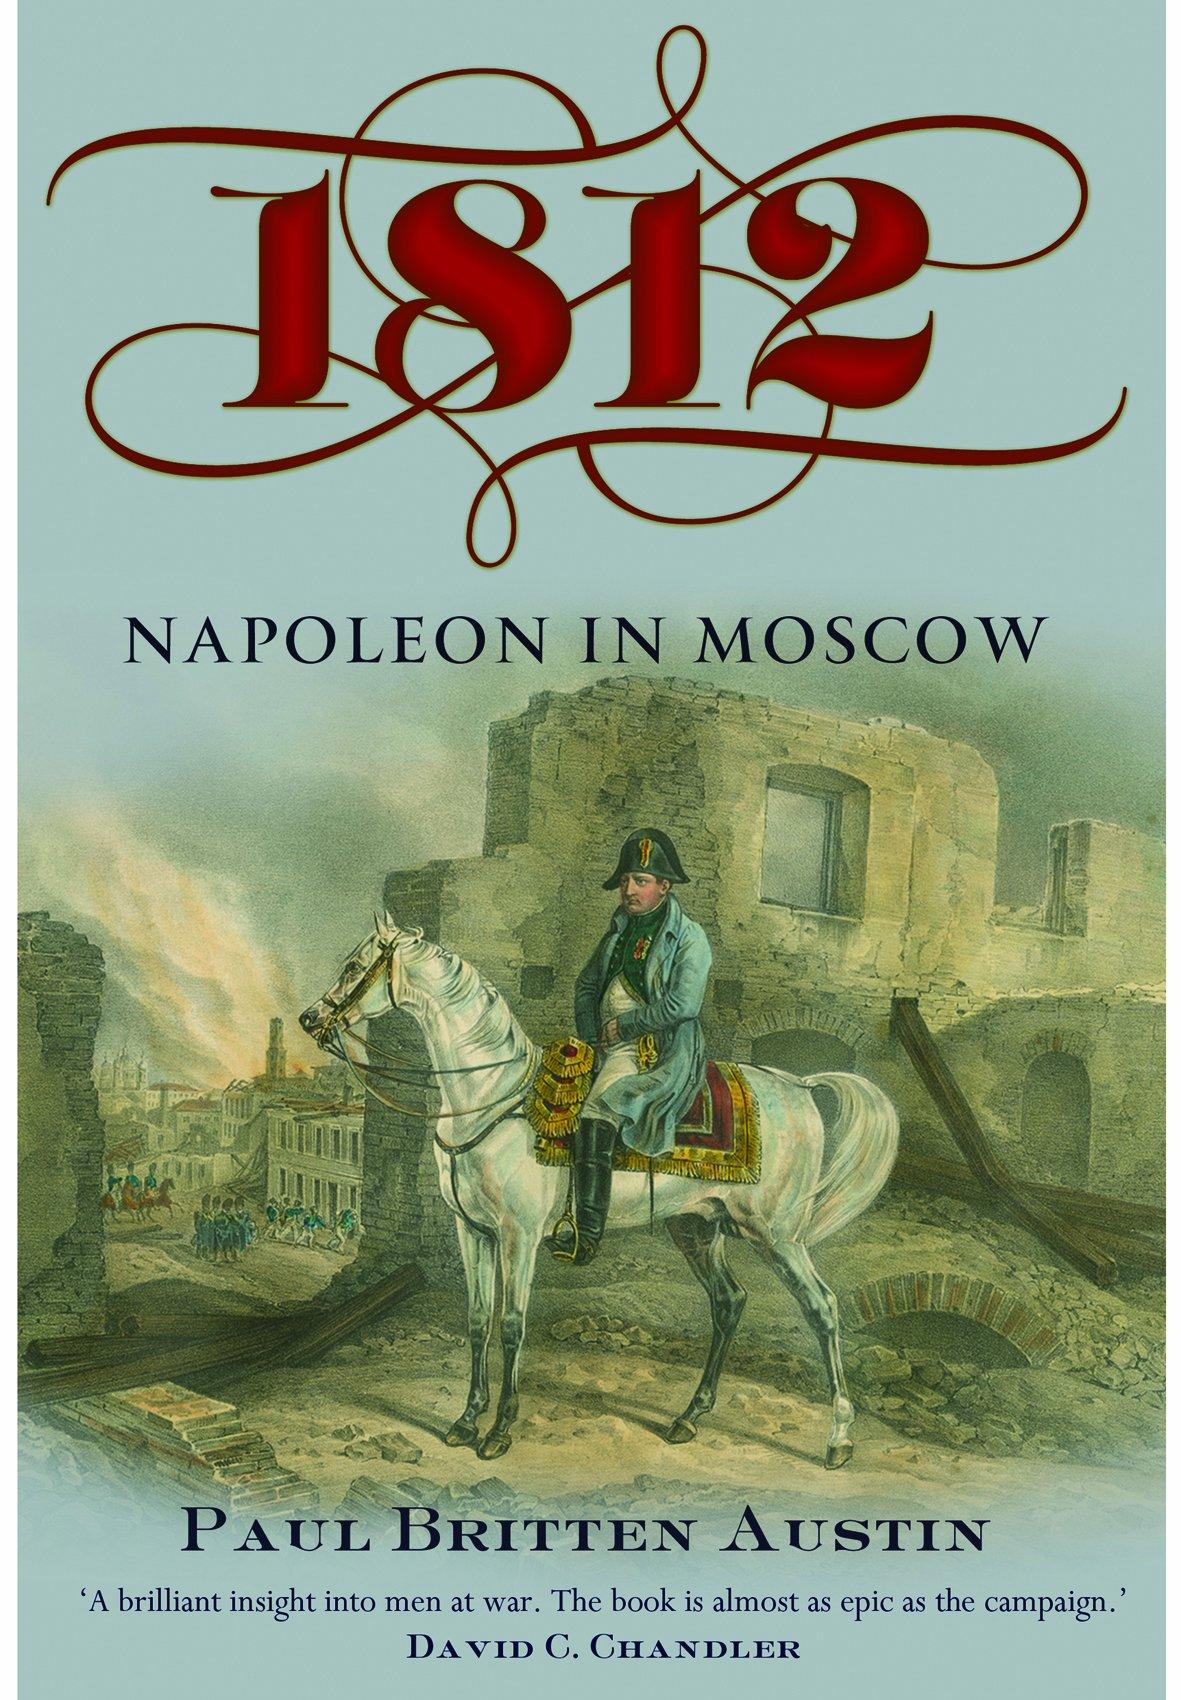 1812: Napoleon in Moscow: Paul Britten Austin: 9781848327030: Amazon.com:  Books